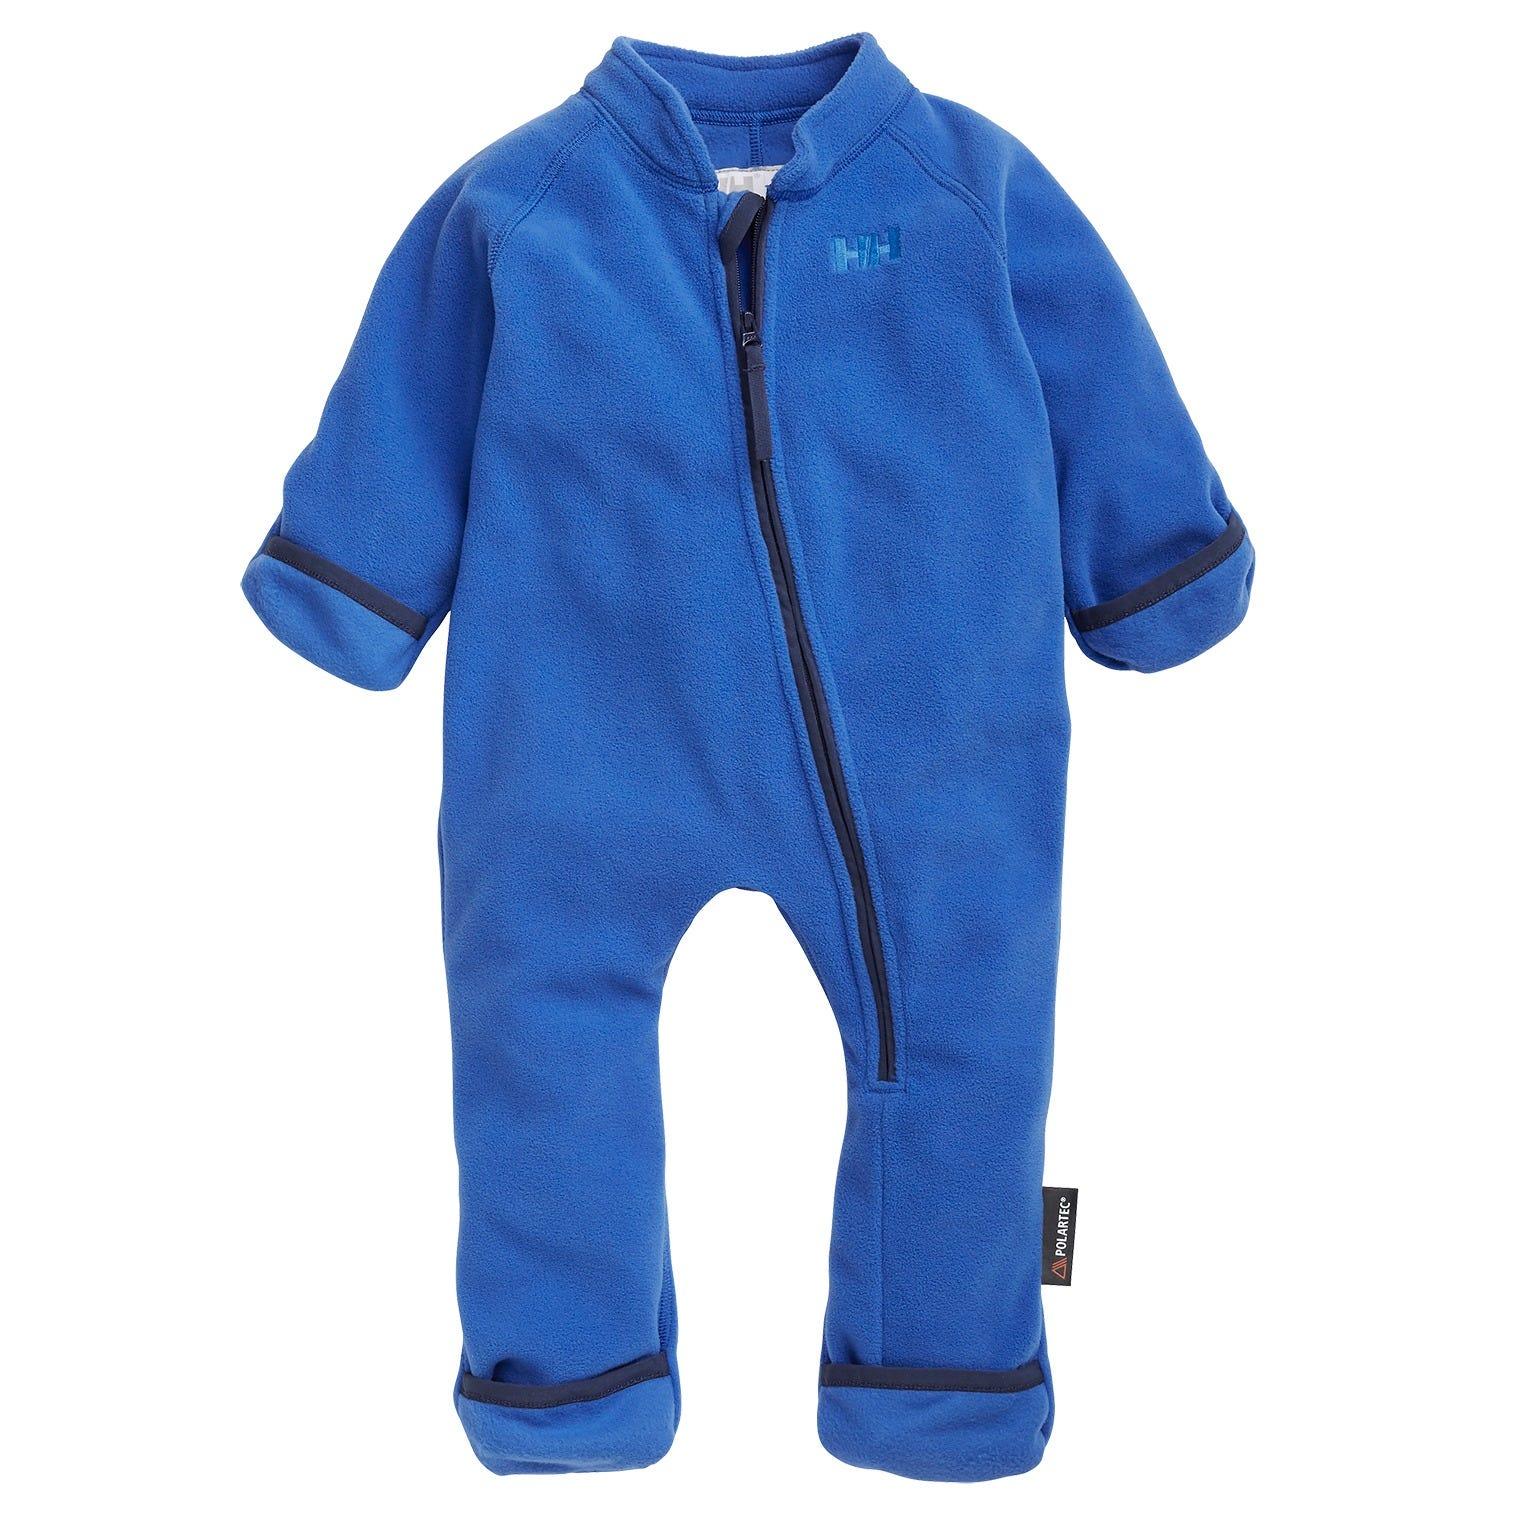 Helly Hansen Baby Legacy Fleece Suit Kids Blue 74/9M